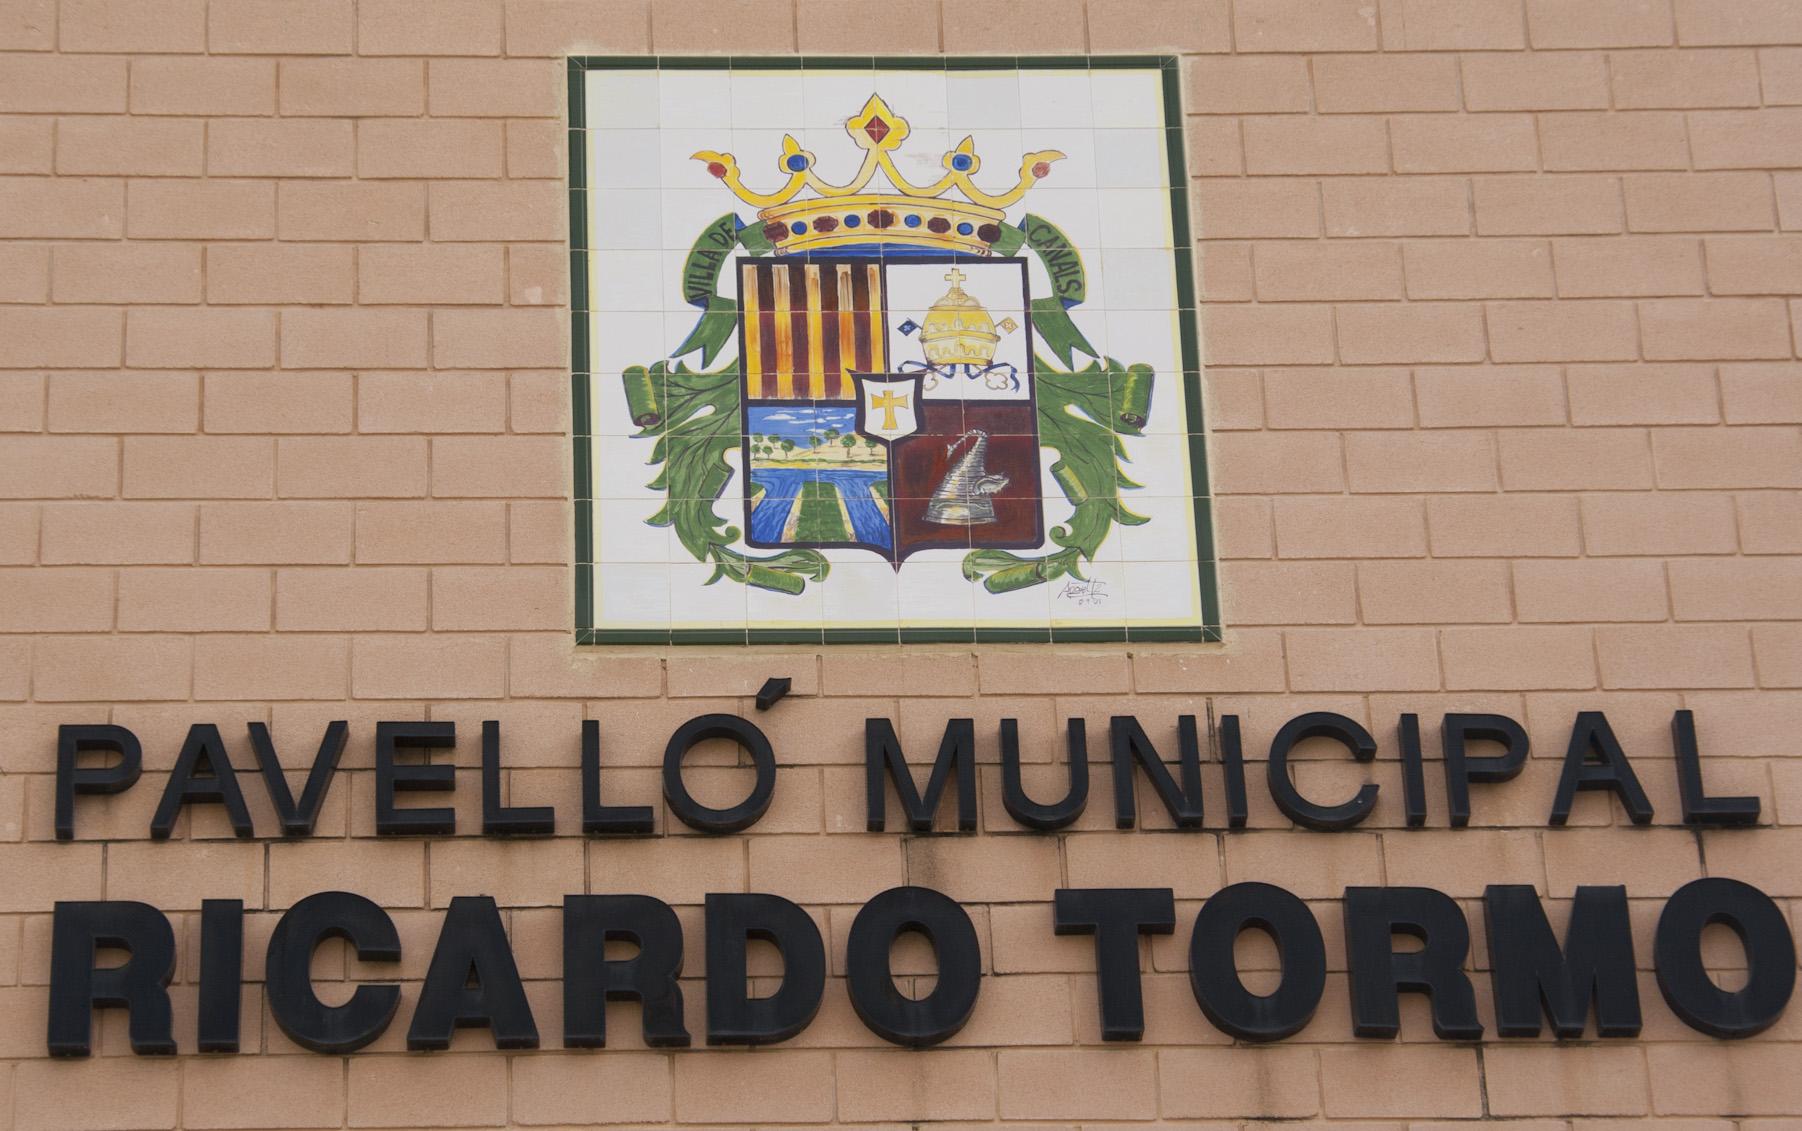 Pavelló Municipal Ricardo Tormo (2).jpg